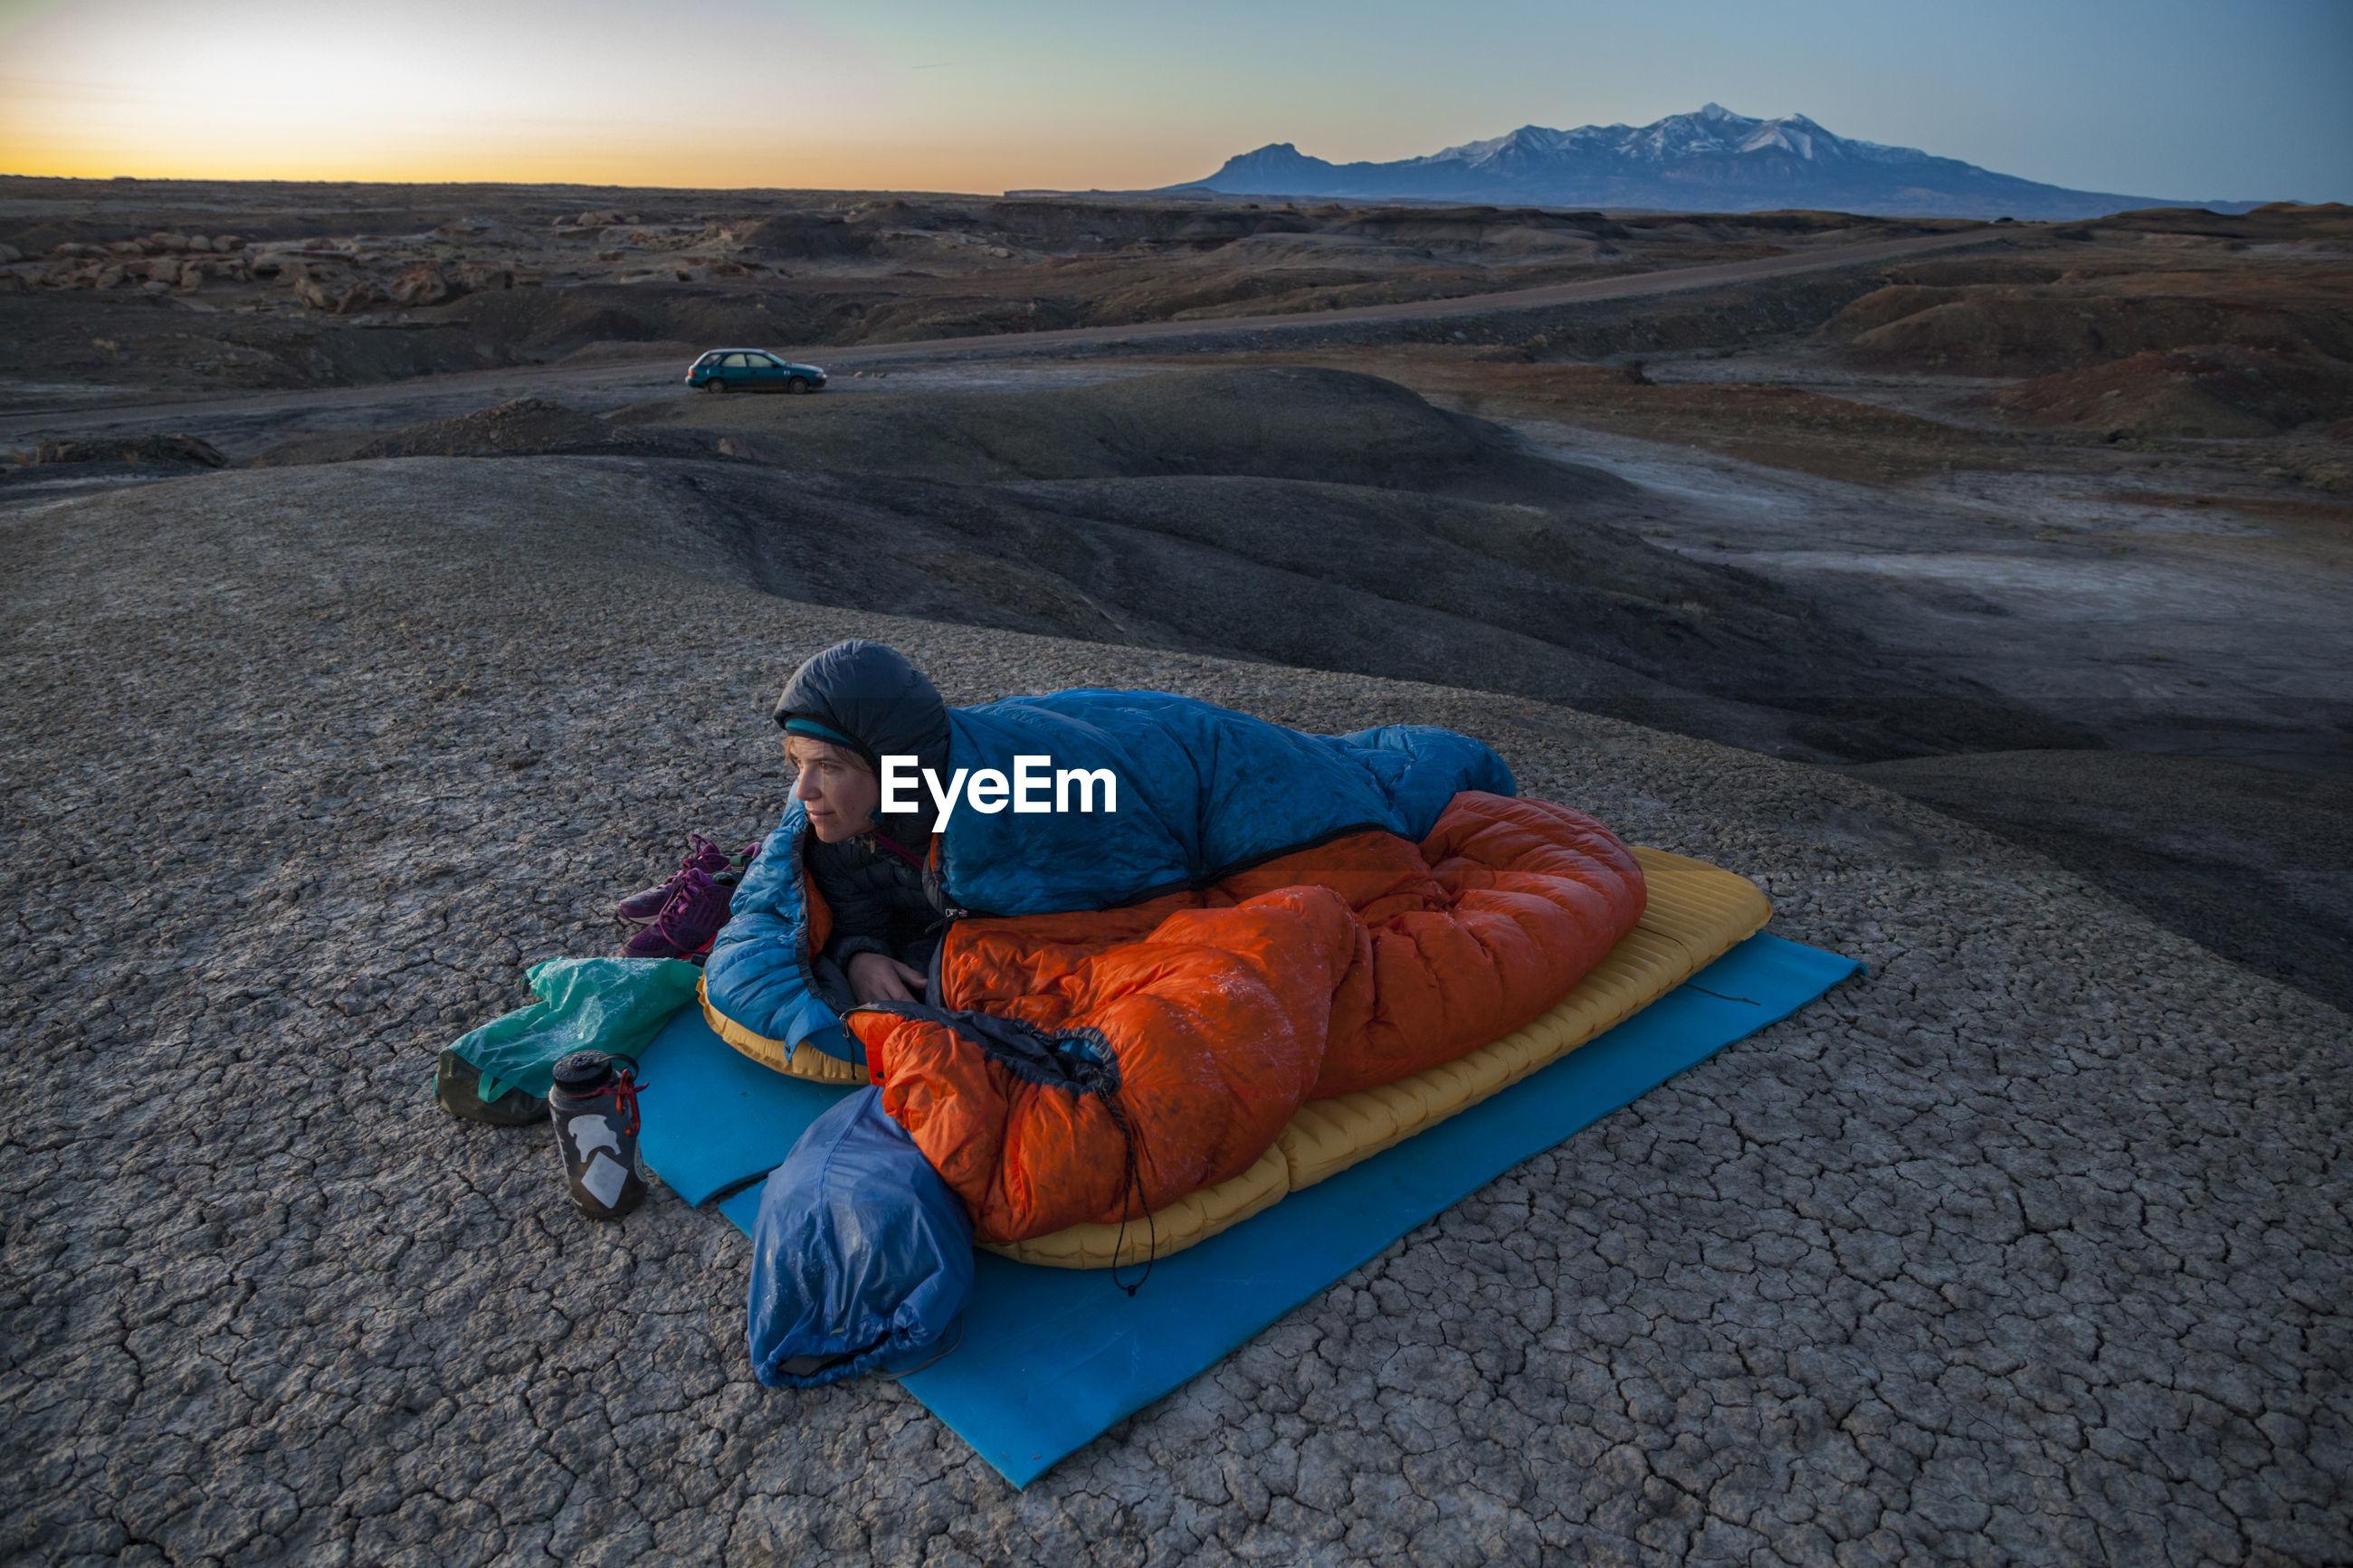 MAN LYING ON ROCK AGAINST SKY